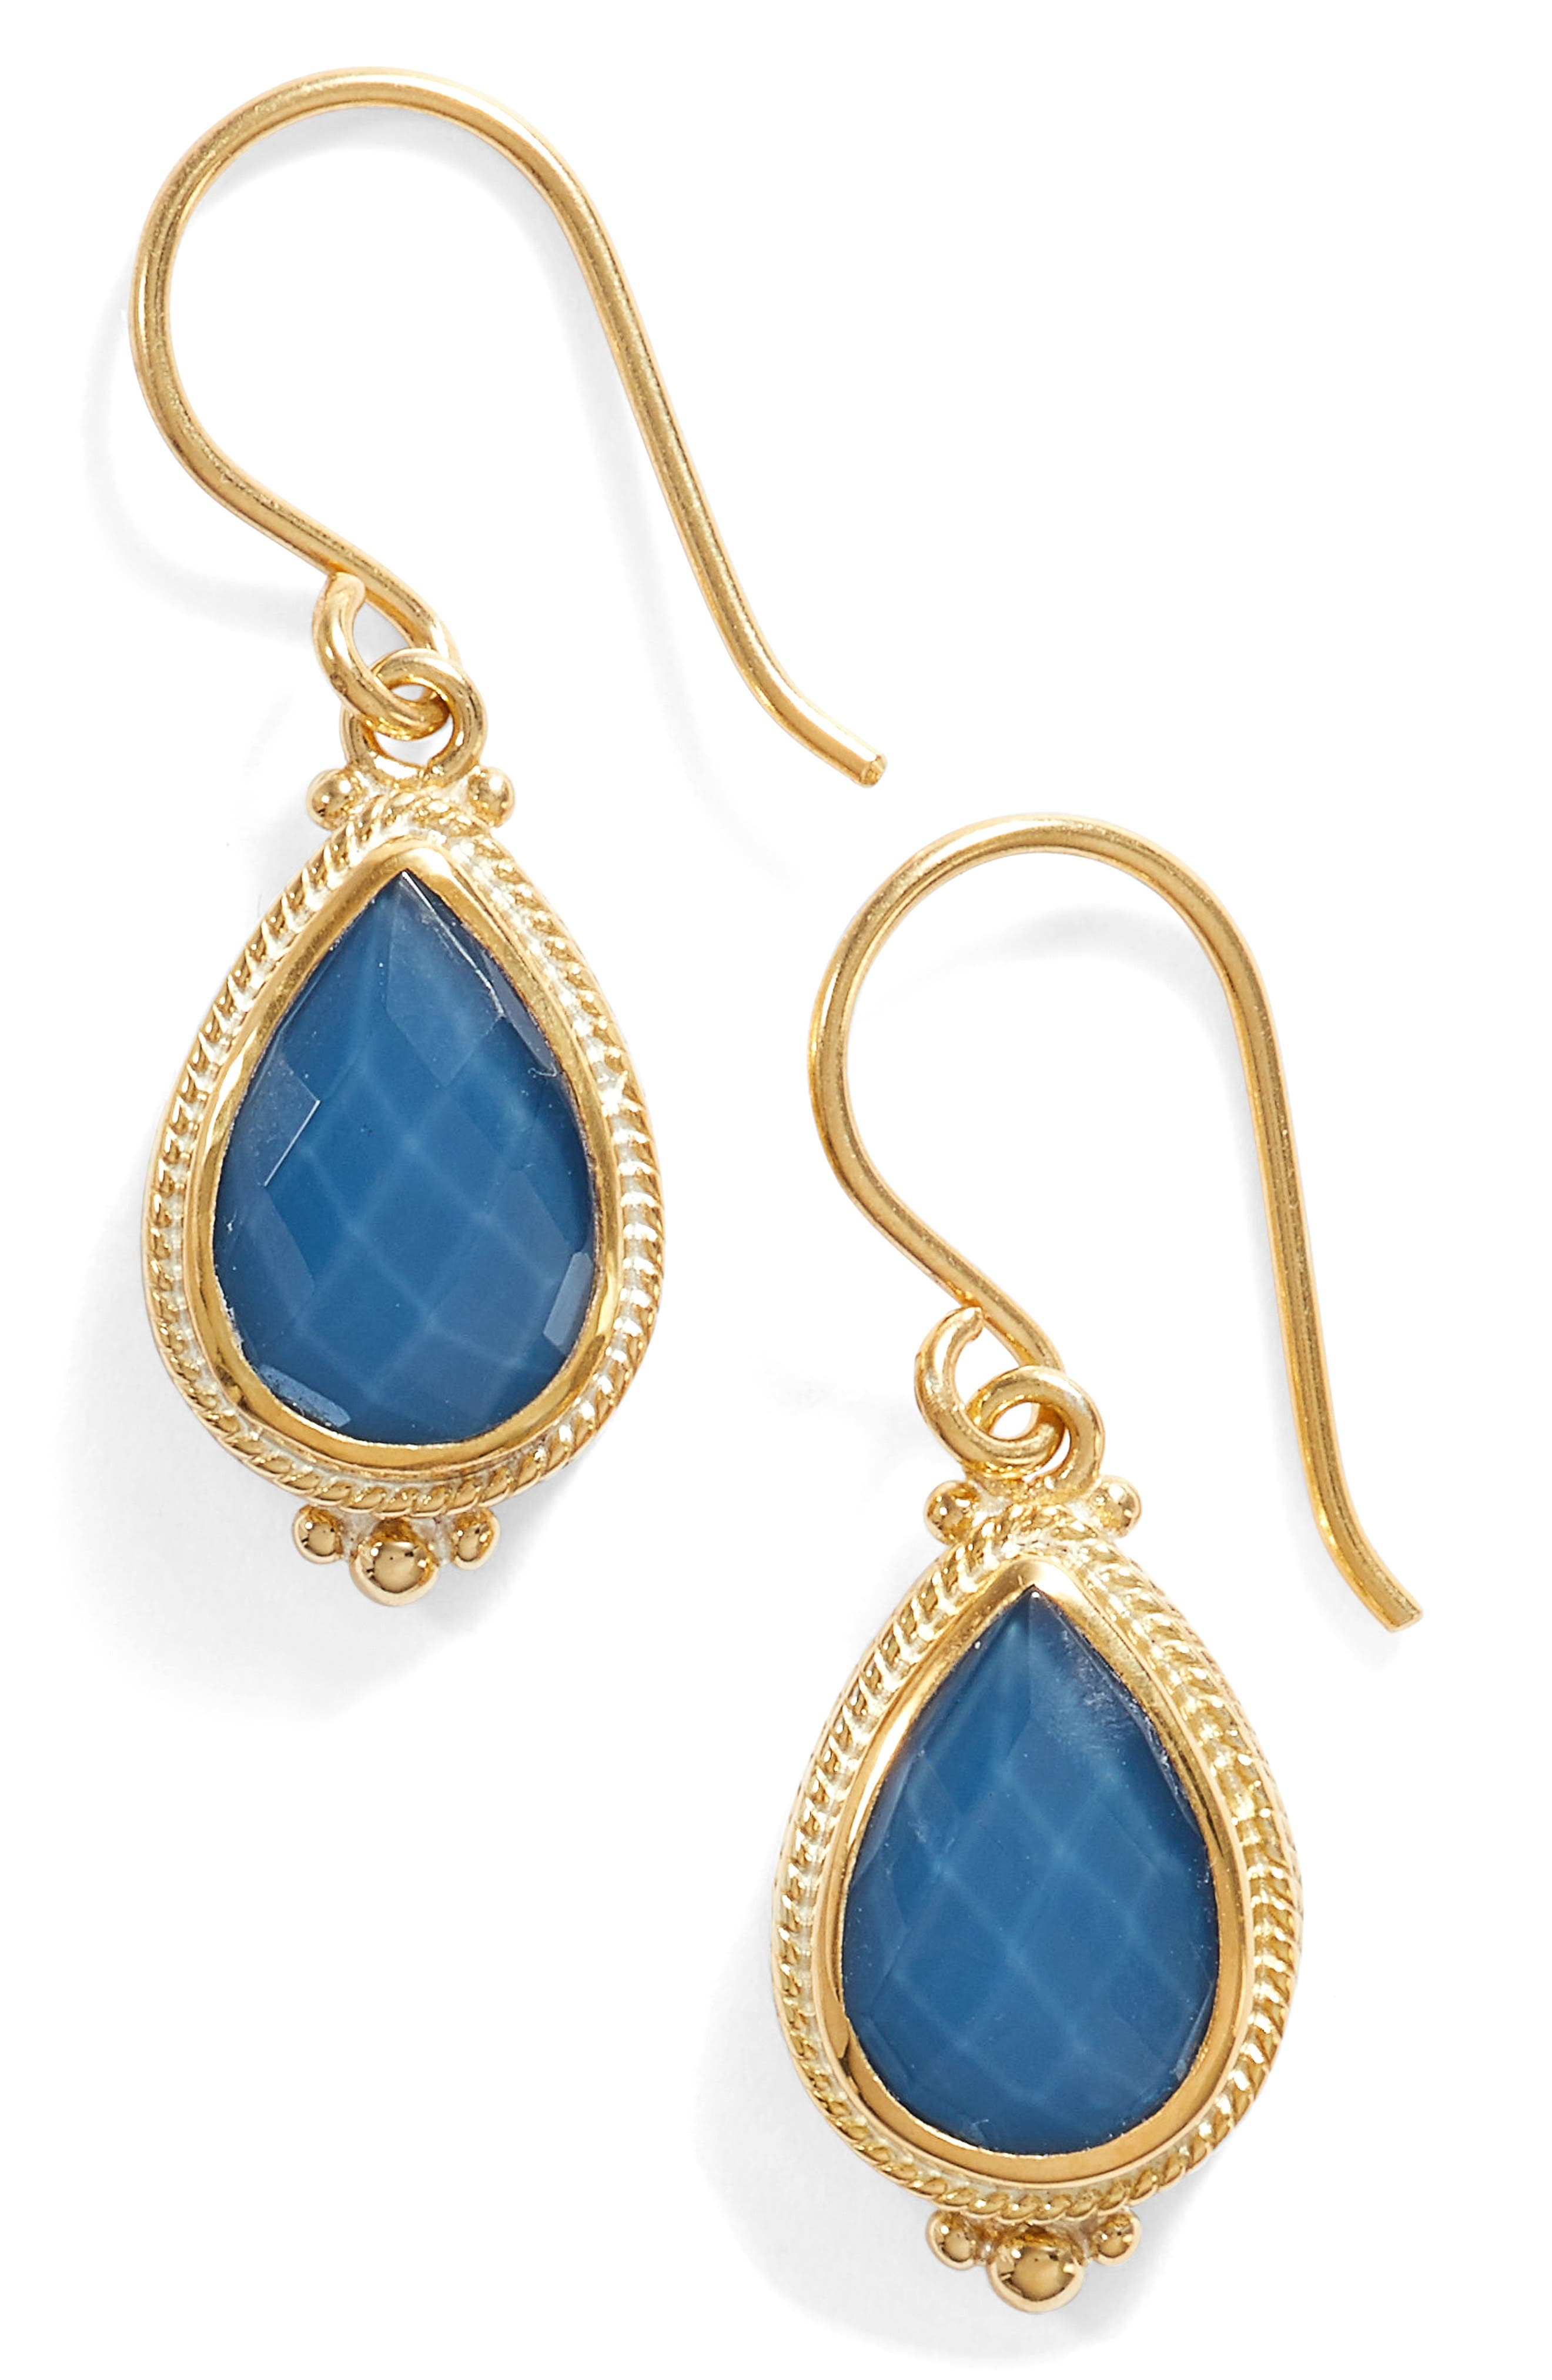 Blue Quartz Small Teardrop Earrings,                             Main thumbnail 1, color,                             400